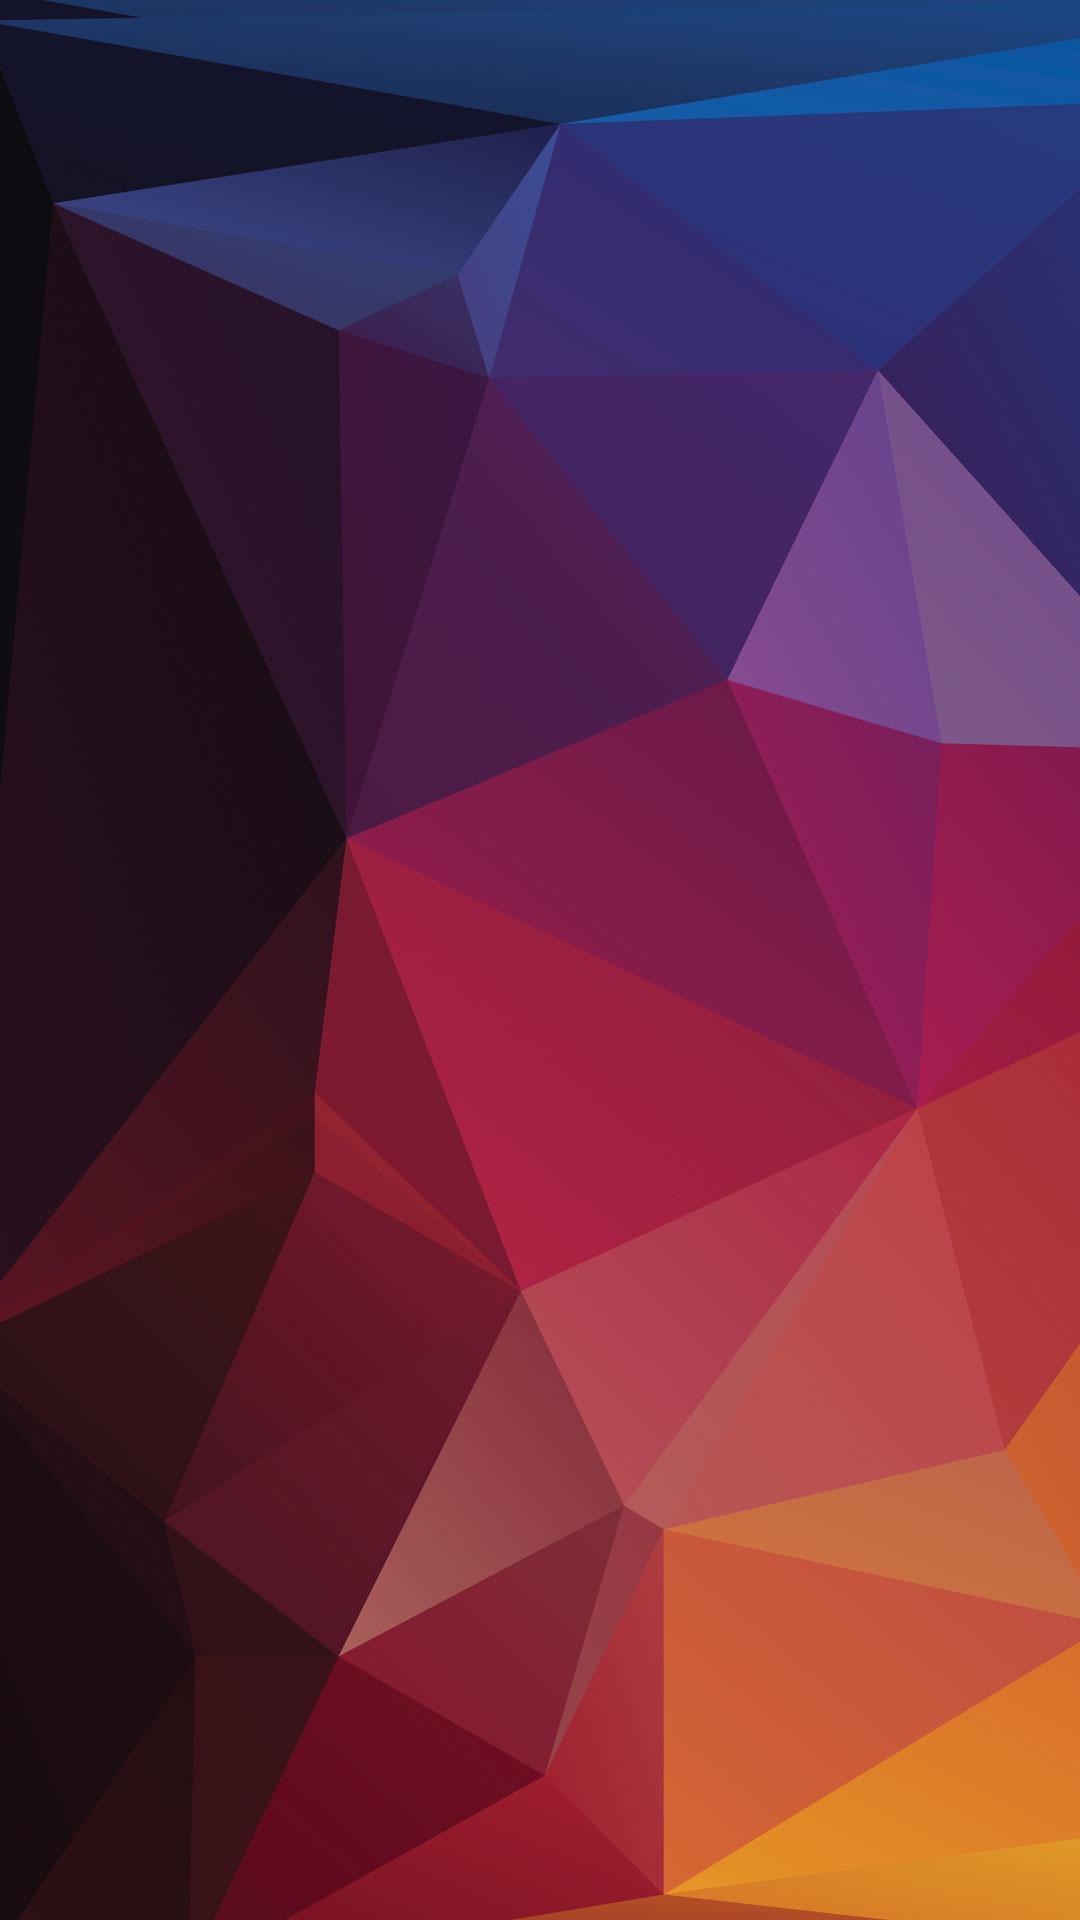 51+ Abstract iPhone 7 Plus Wallpaper on WallpaperSafari